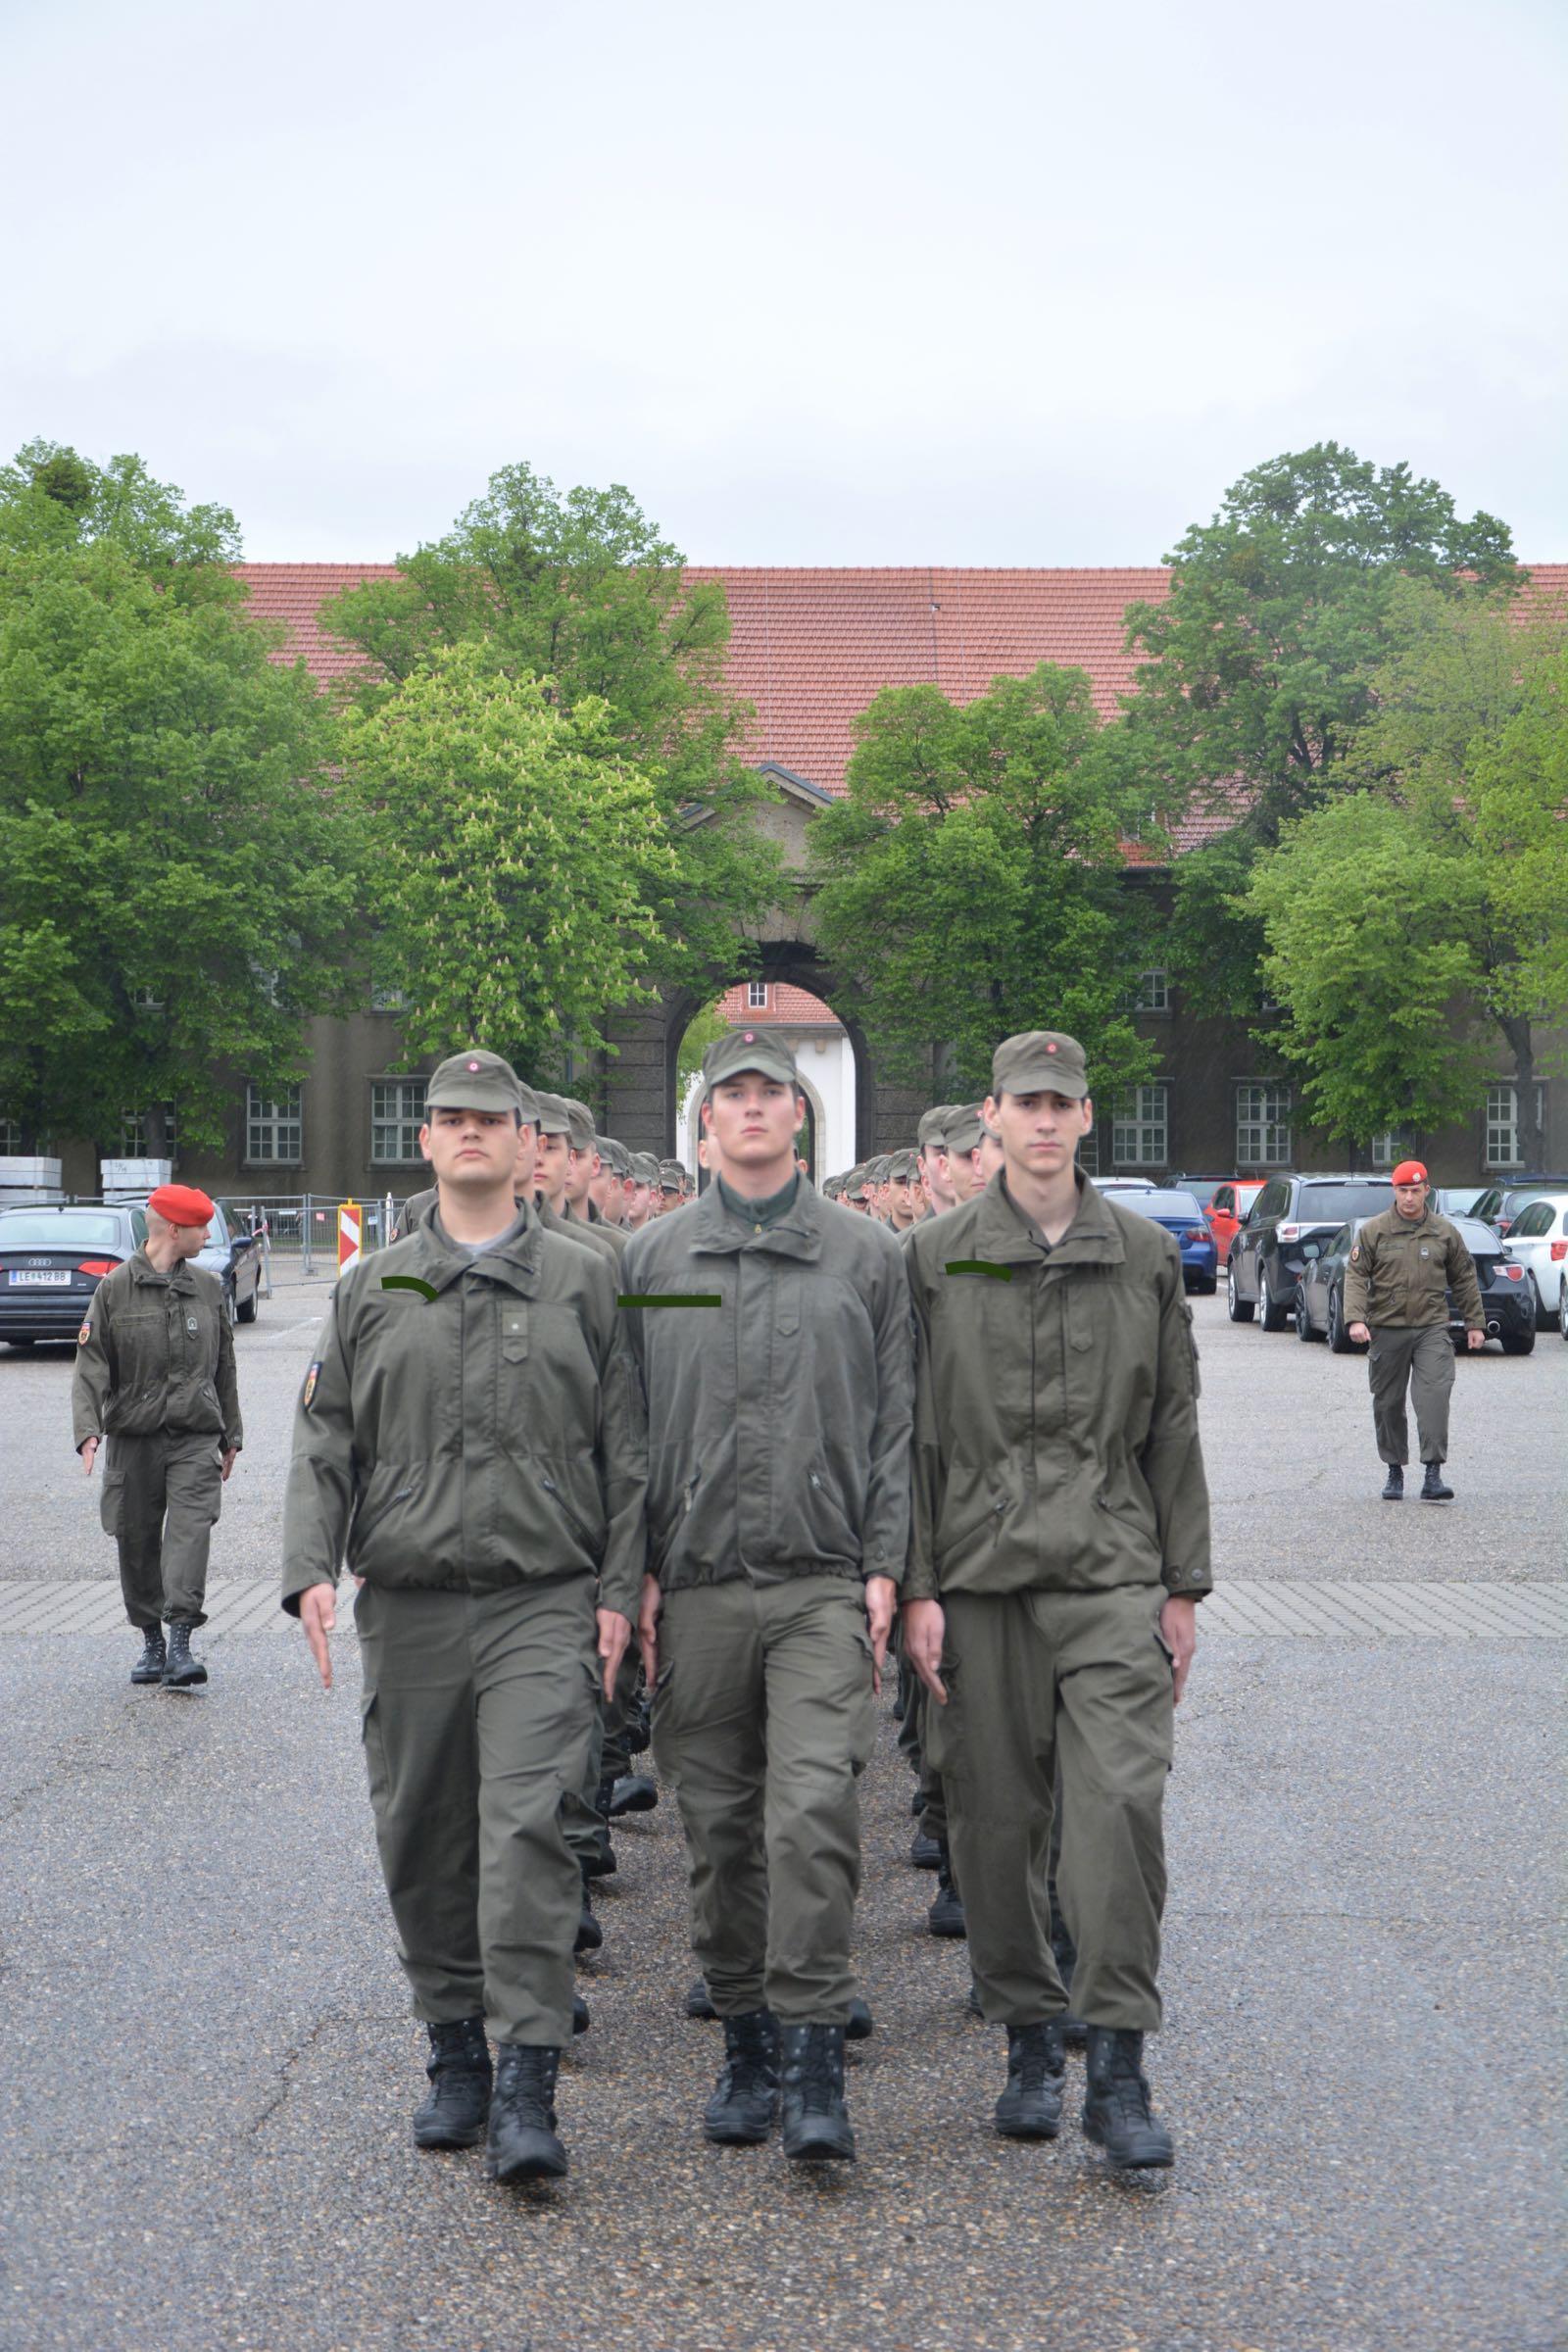 2019_04_30_Beförderung_Pippan - 2 of 8